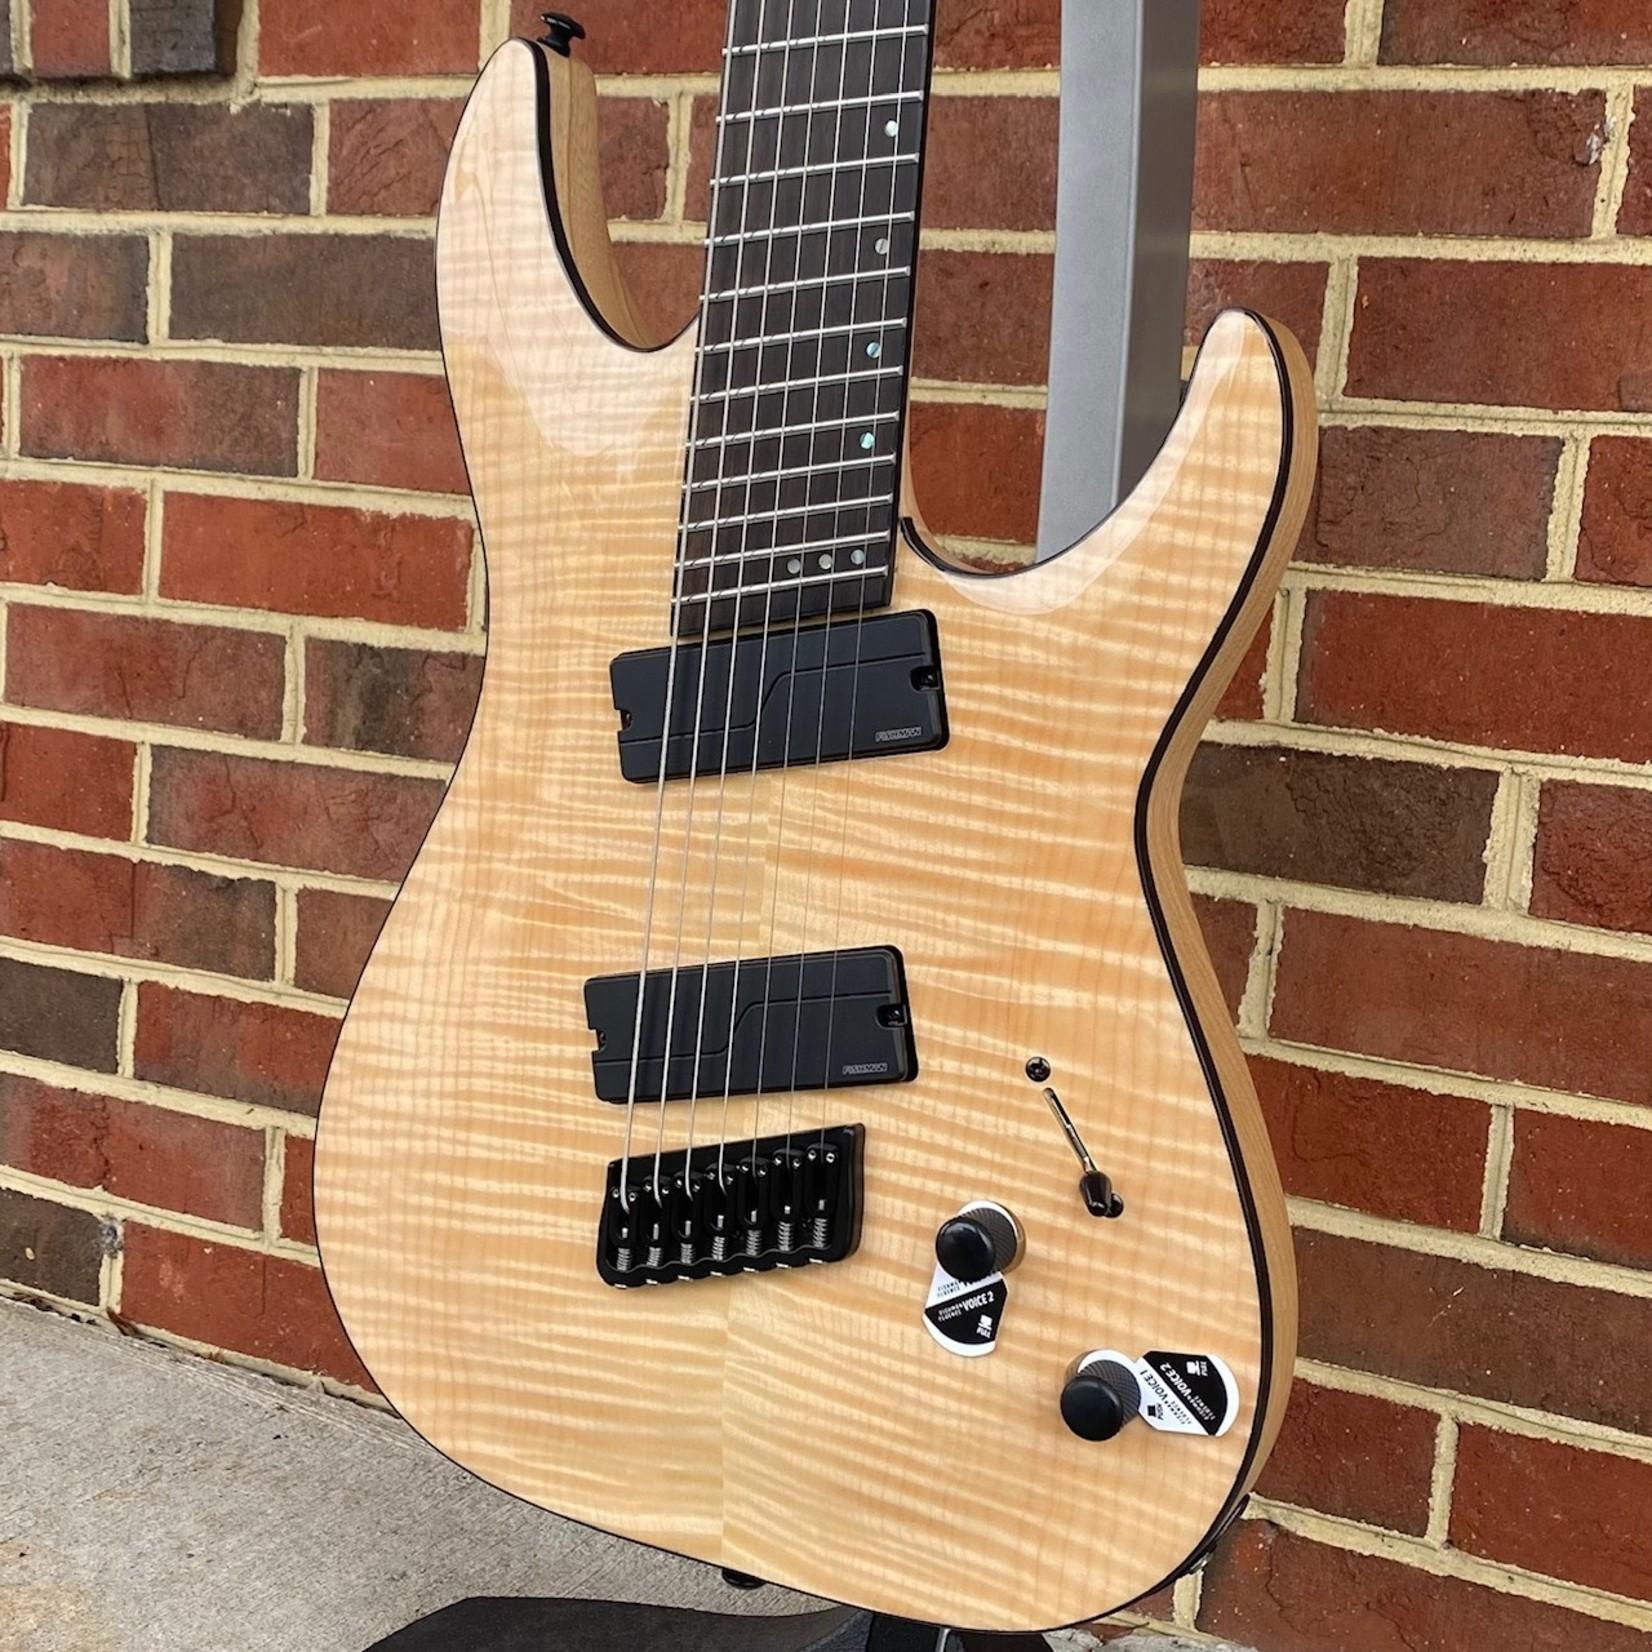 Schecter Guitar Research Schecter C-7 Multiscale SLS Elite, Gloss Natural, Flamed Maple Top, Neck Thru, Ebony Fretboard, Locking Tuners, Fishman Fluence Modern Pickups, Hipshot Bridge